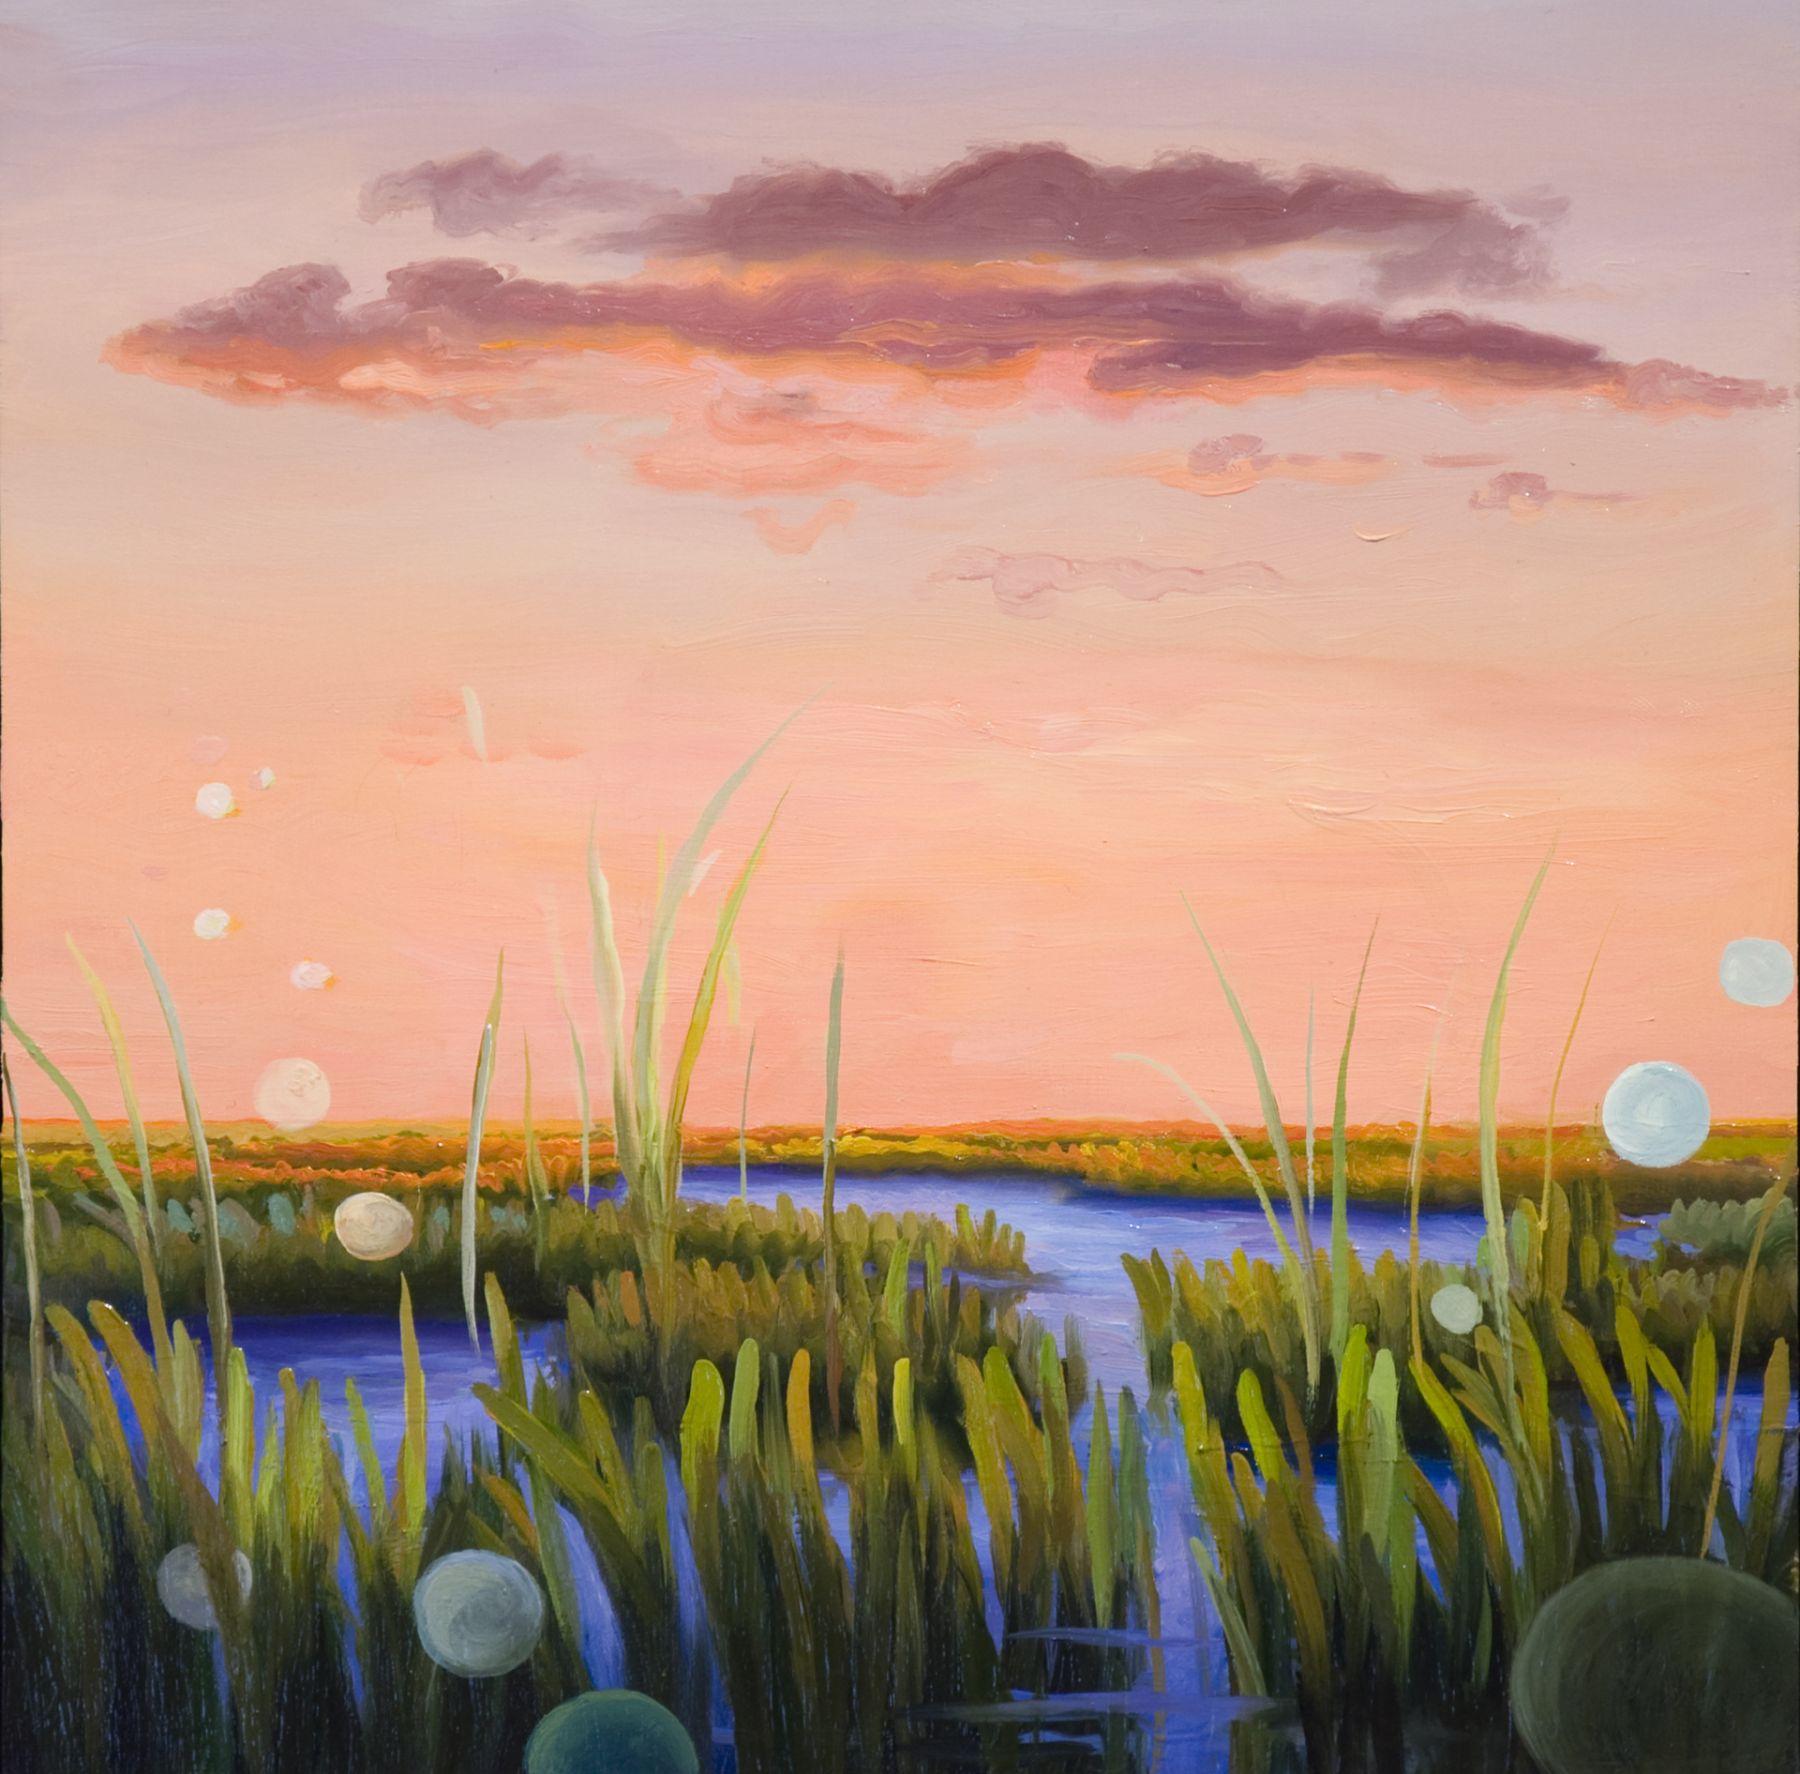 Phoebe Brunner, Pink Dawn, 2017